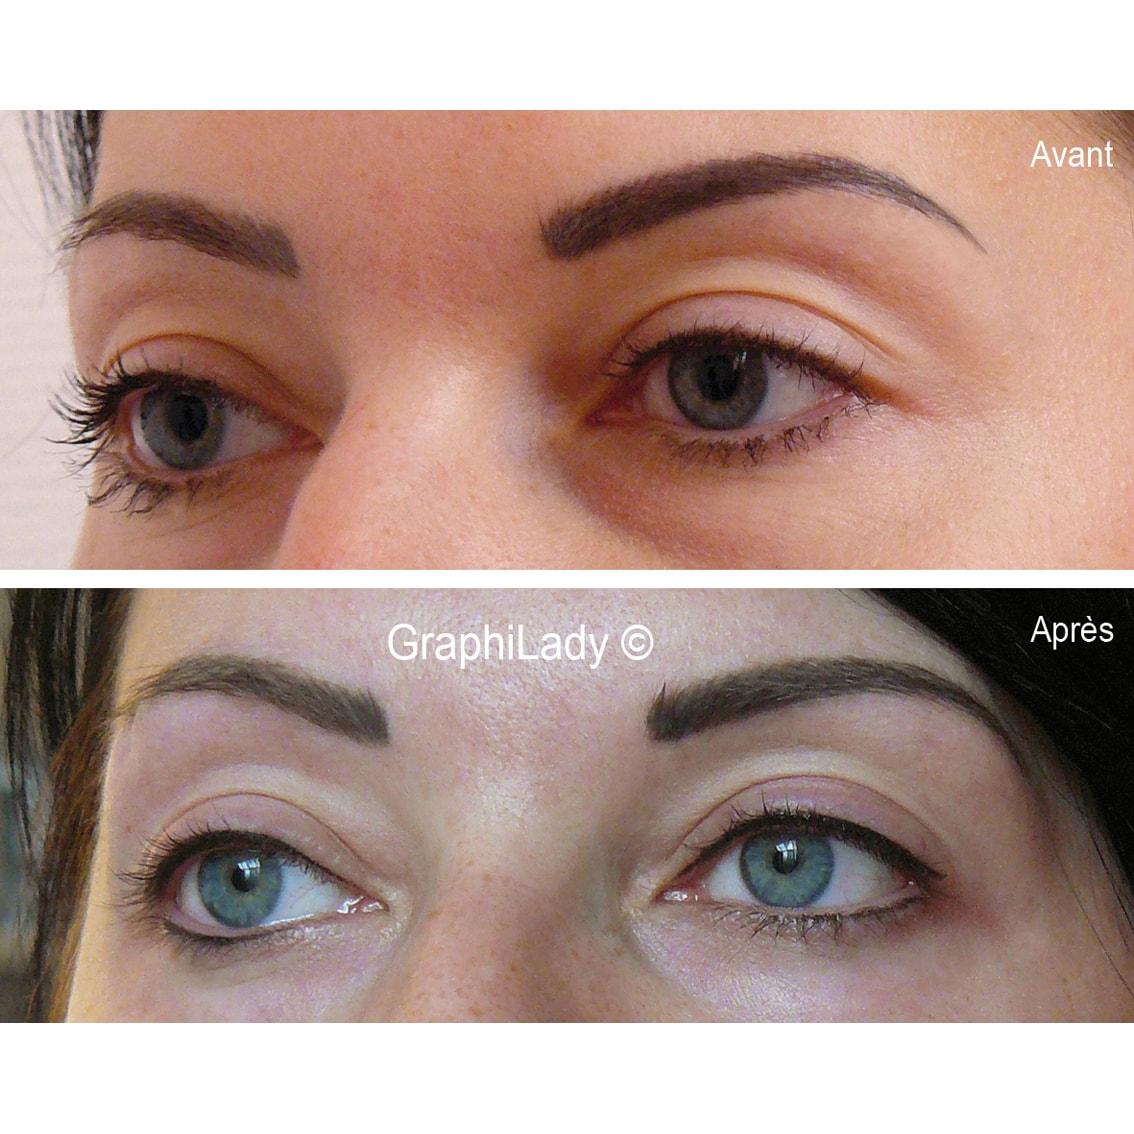 maquillage permanent EL 06